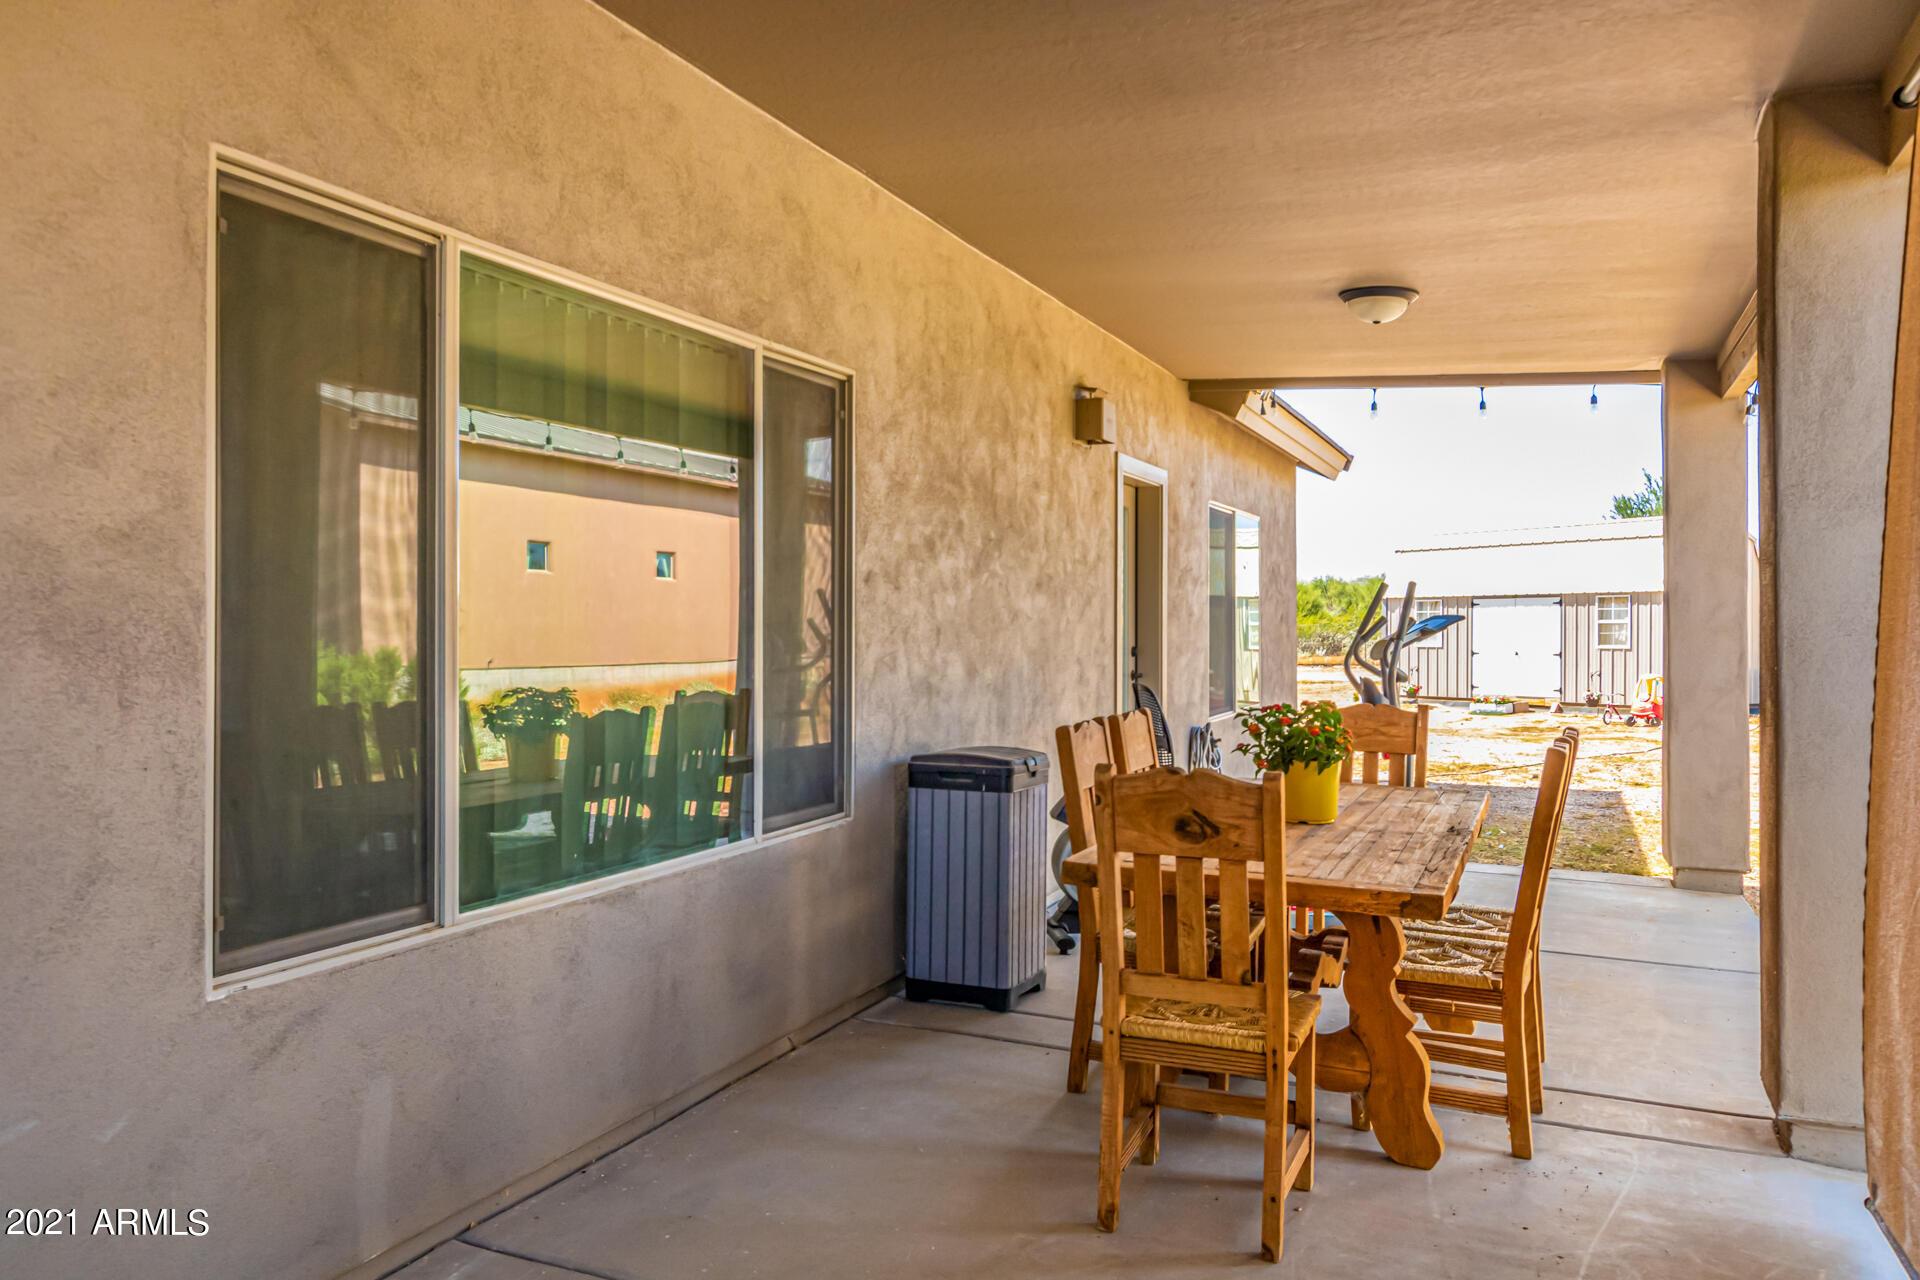 Scottsdale AZ 85263 Photo 27